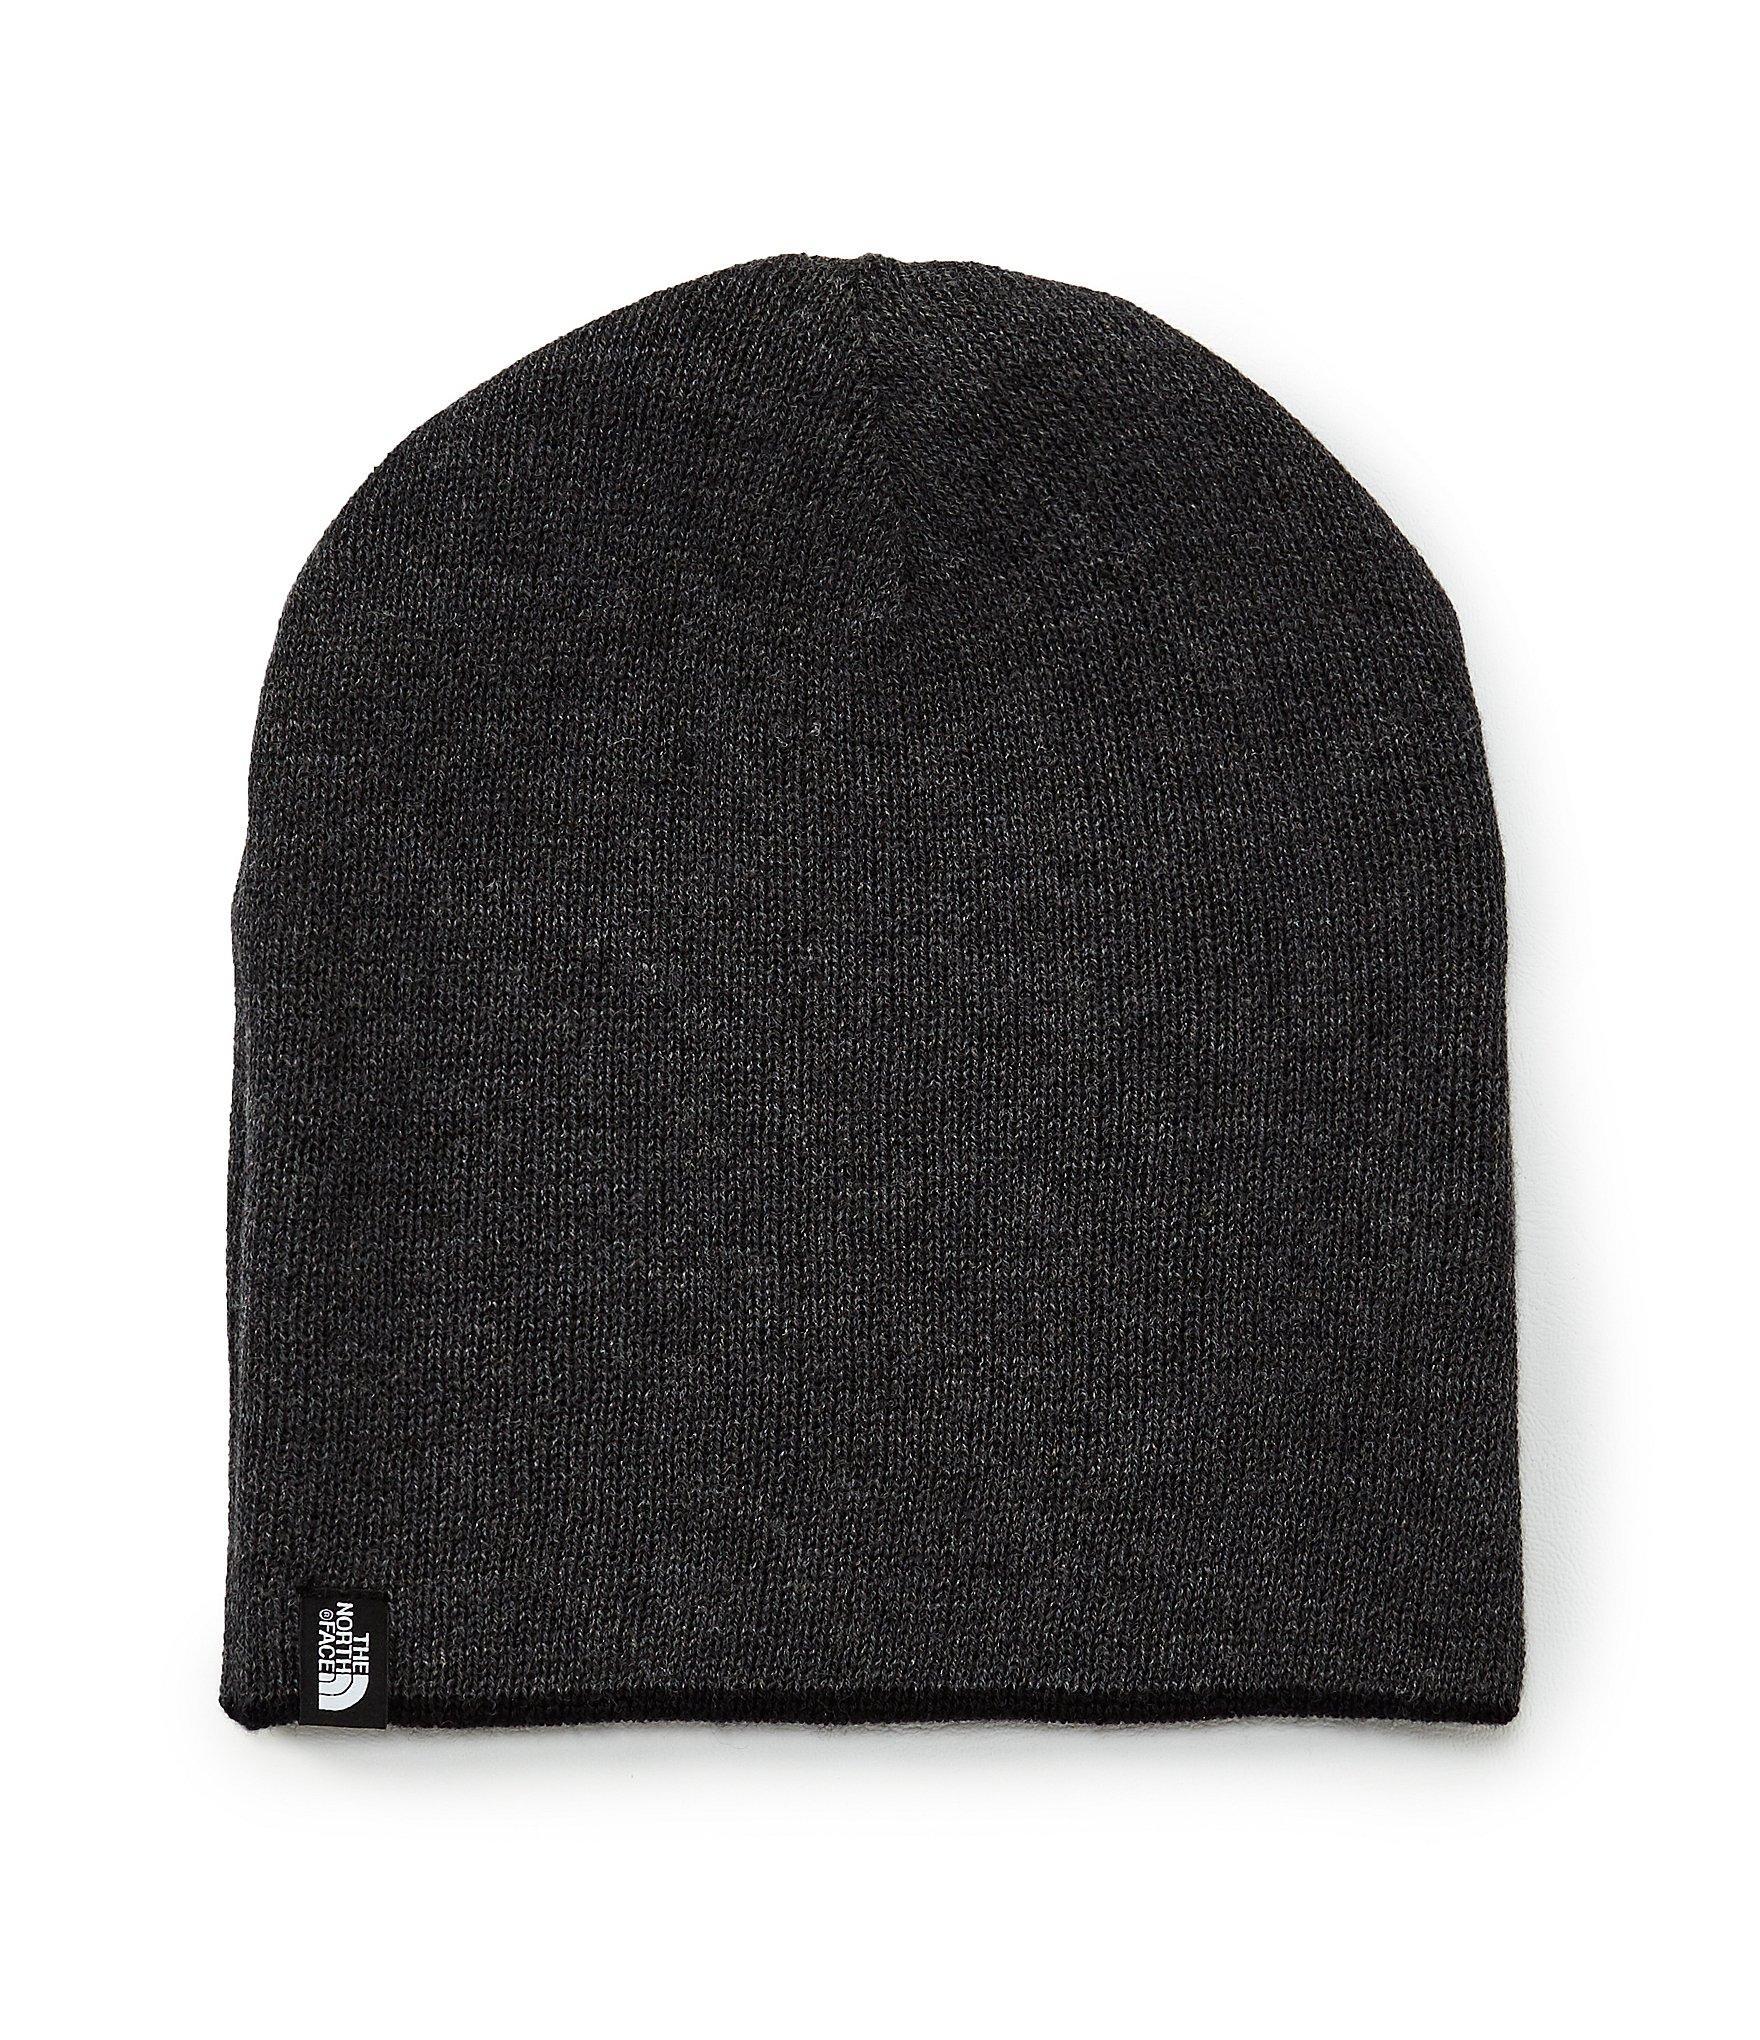 72af5647353 Lyst - The North Face Men s Merino Reversible Beanie in Black for Men